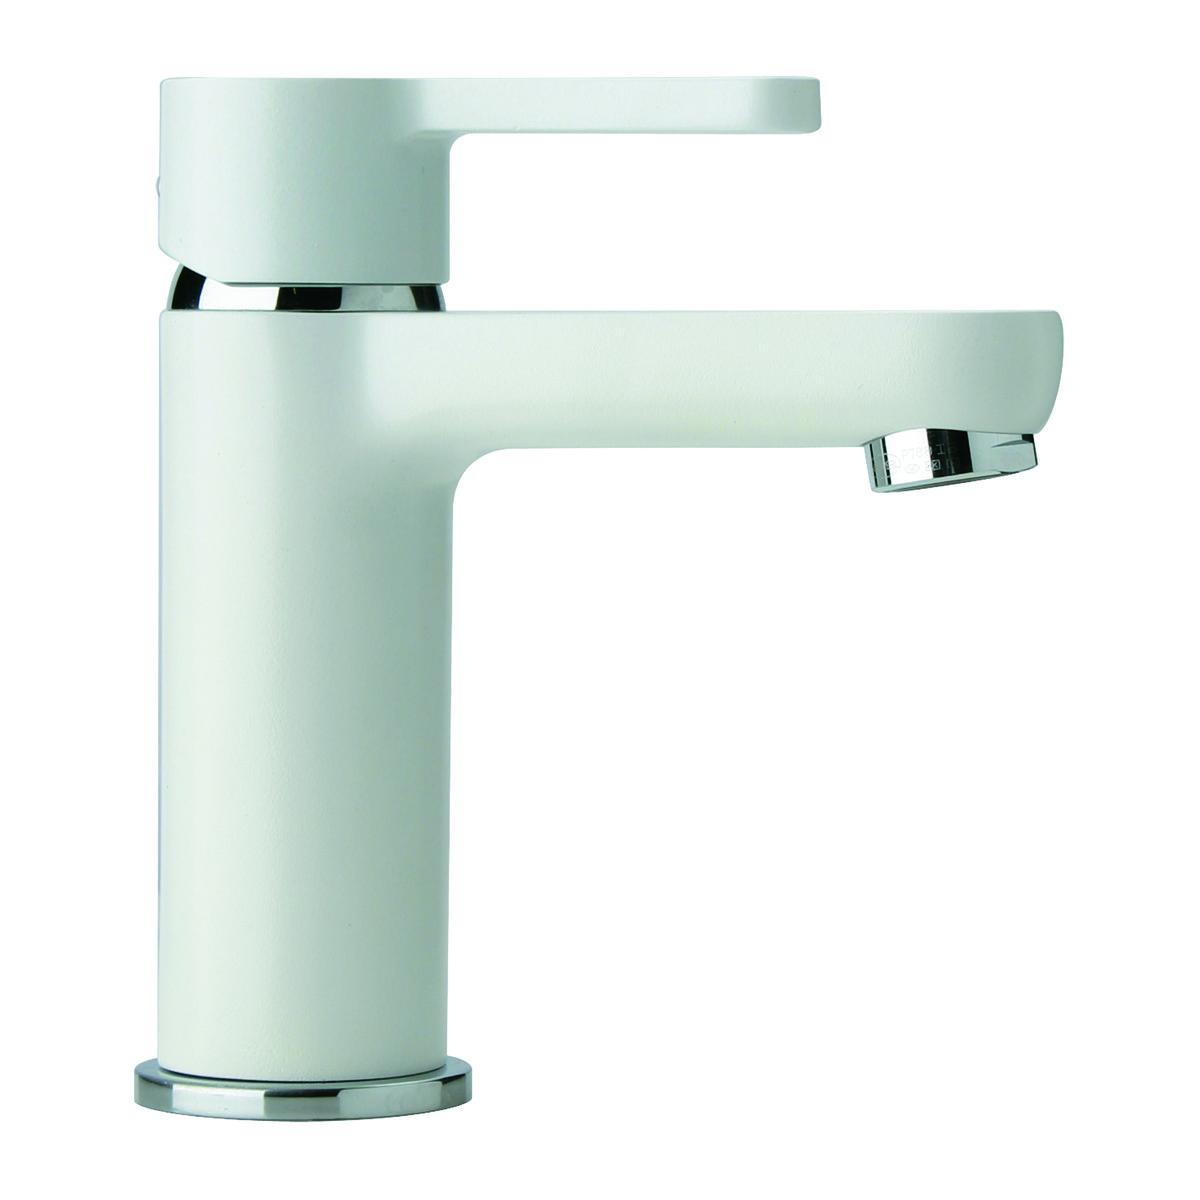 Stunning rubinetti cucina leroy merlin pictures home - Leroy merlin rubinetti bagno ...